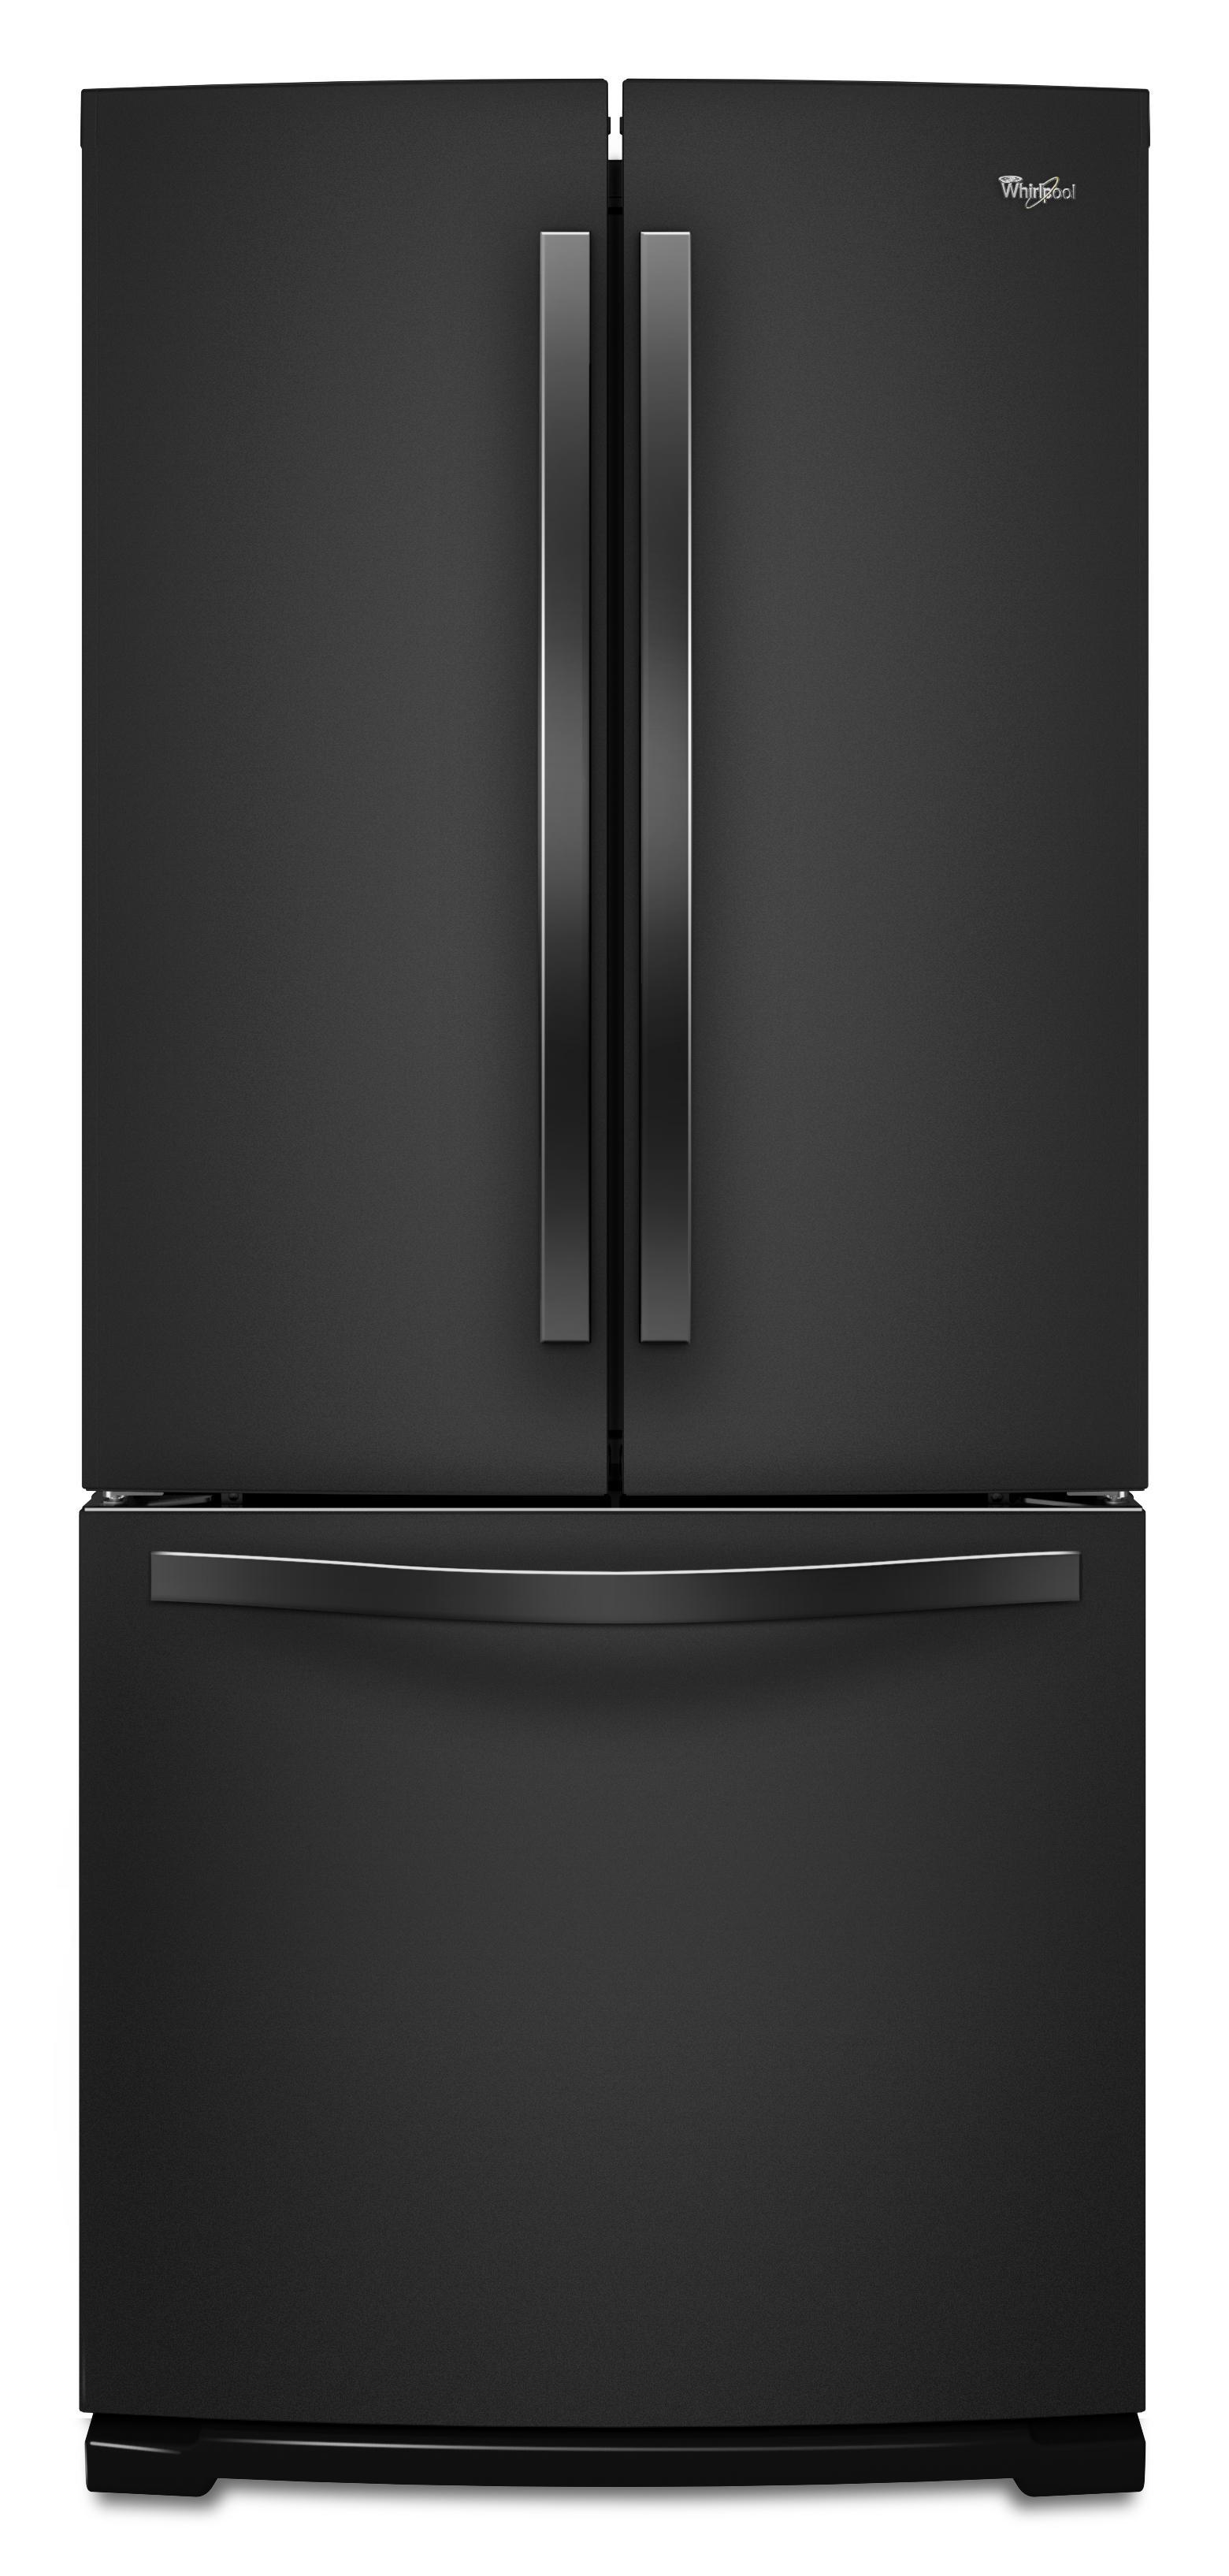 Whirlpool French Door Refrigerators 19.6 Cu. Ft. French-Door Refrigerator - Item Number: WRF560SMYB